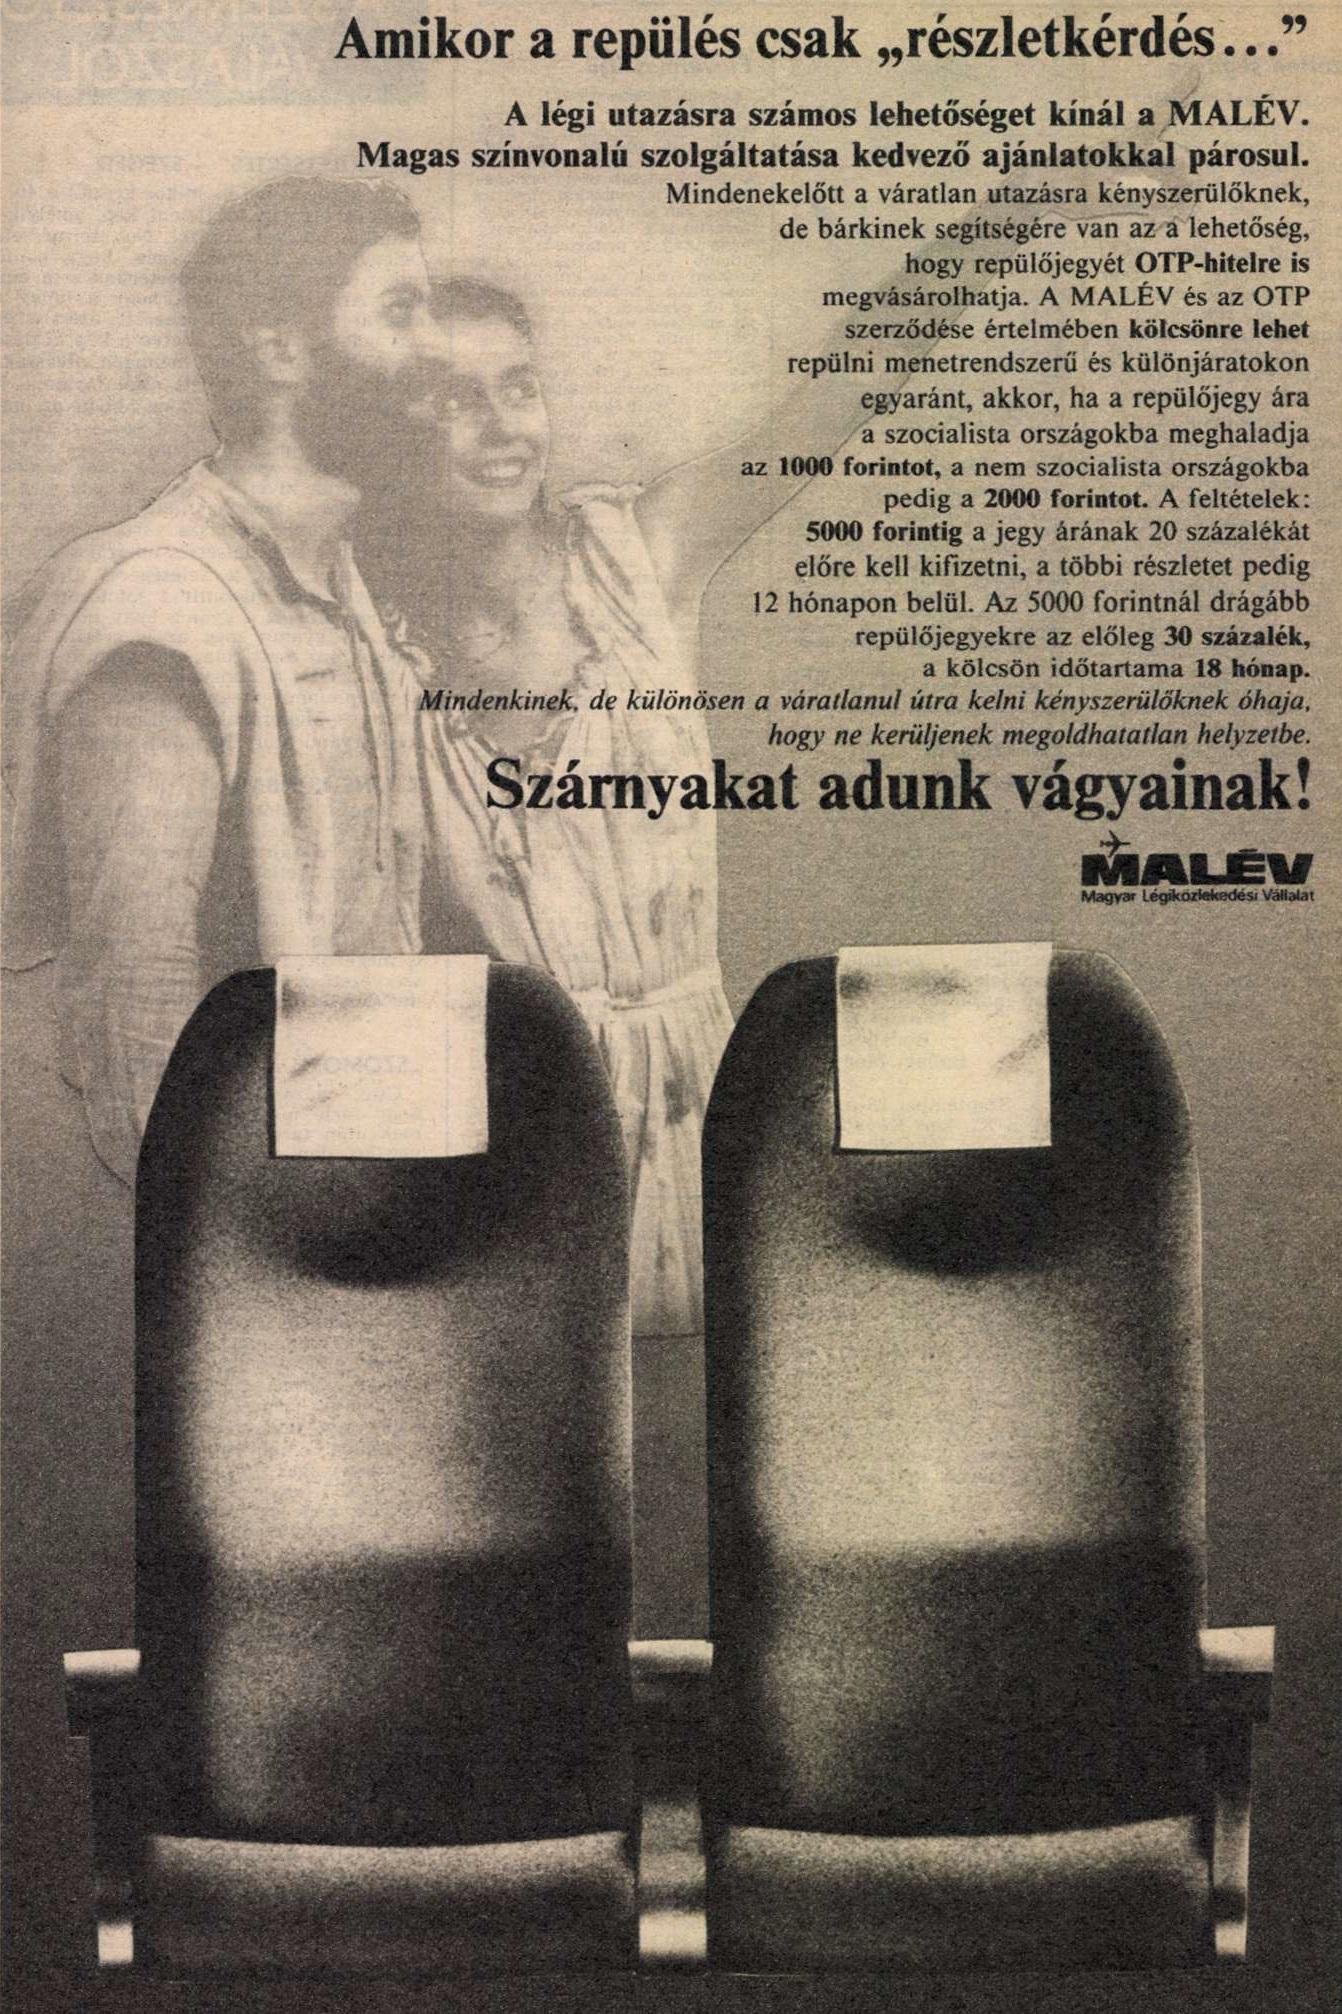 idokapszula_nb_i_1983_84_magyarorszag_dania_eb-selejtezo_reklam_3.jpg